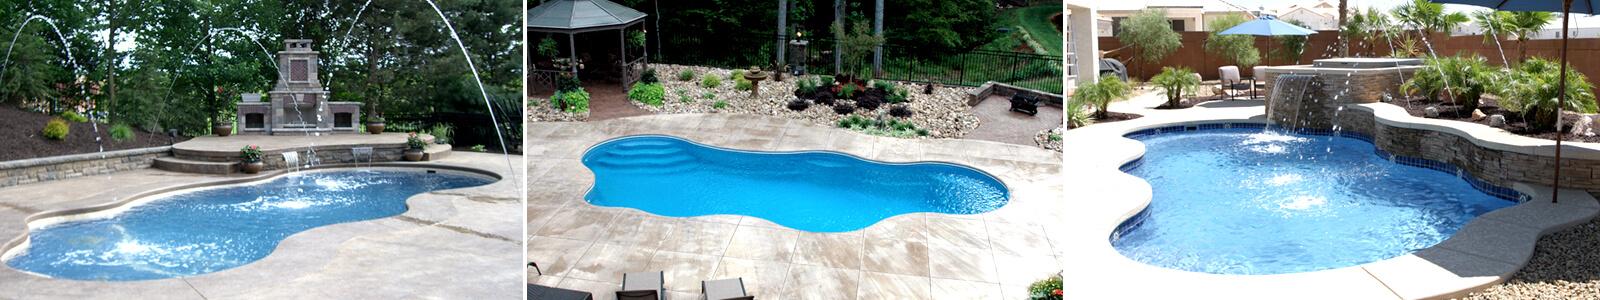 Viking Free Form Pools Azure Pools Spas